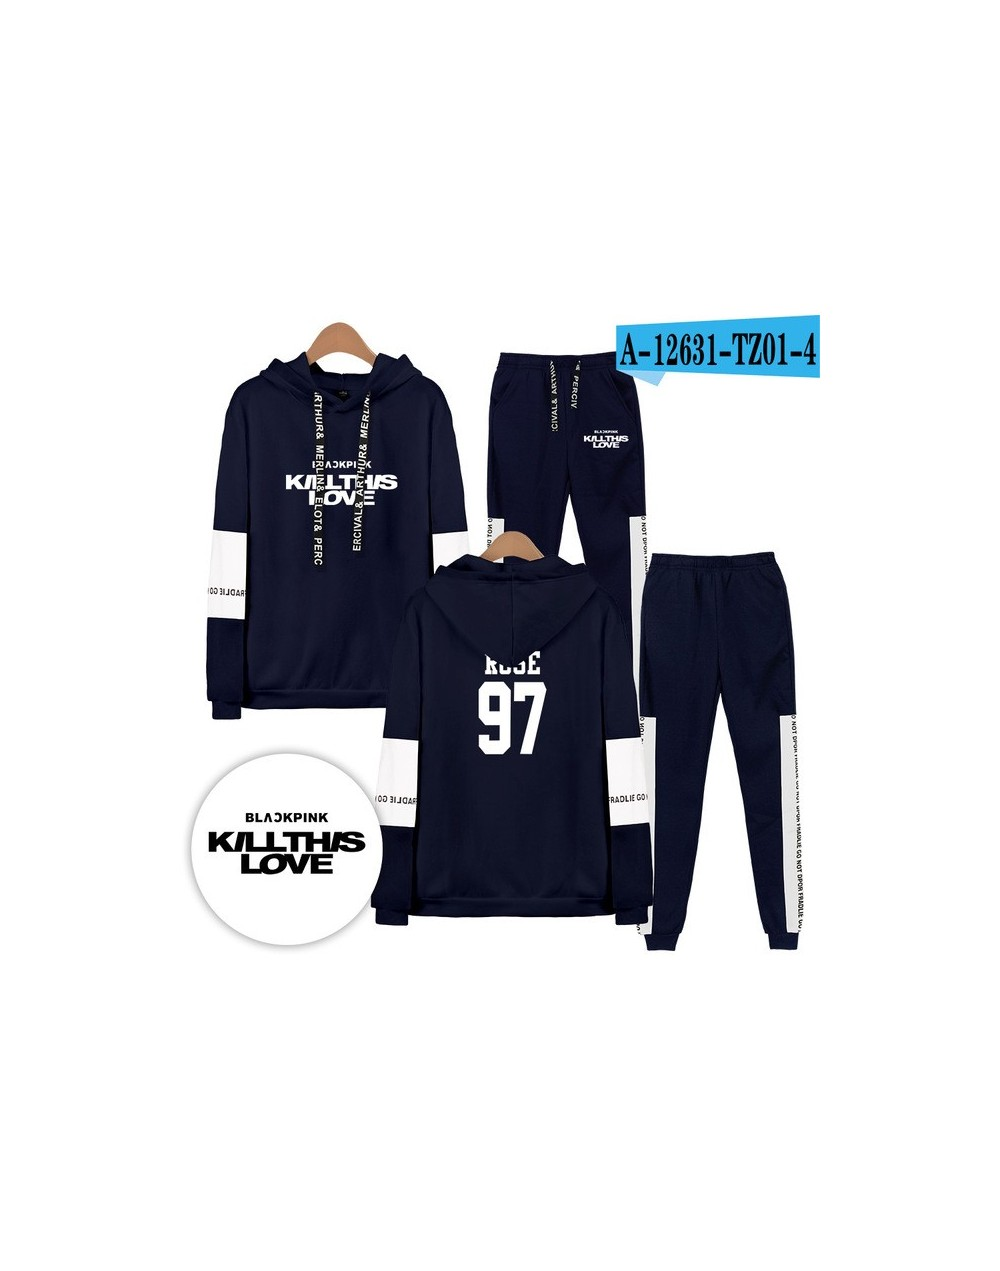 Blackpink killthislove Tracksuit 2pcs Women Set Hoodies Crop Top Sweatshirt Side Stripe Pants Hooded Sets Women men Suits - ...